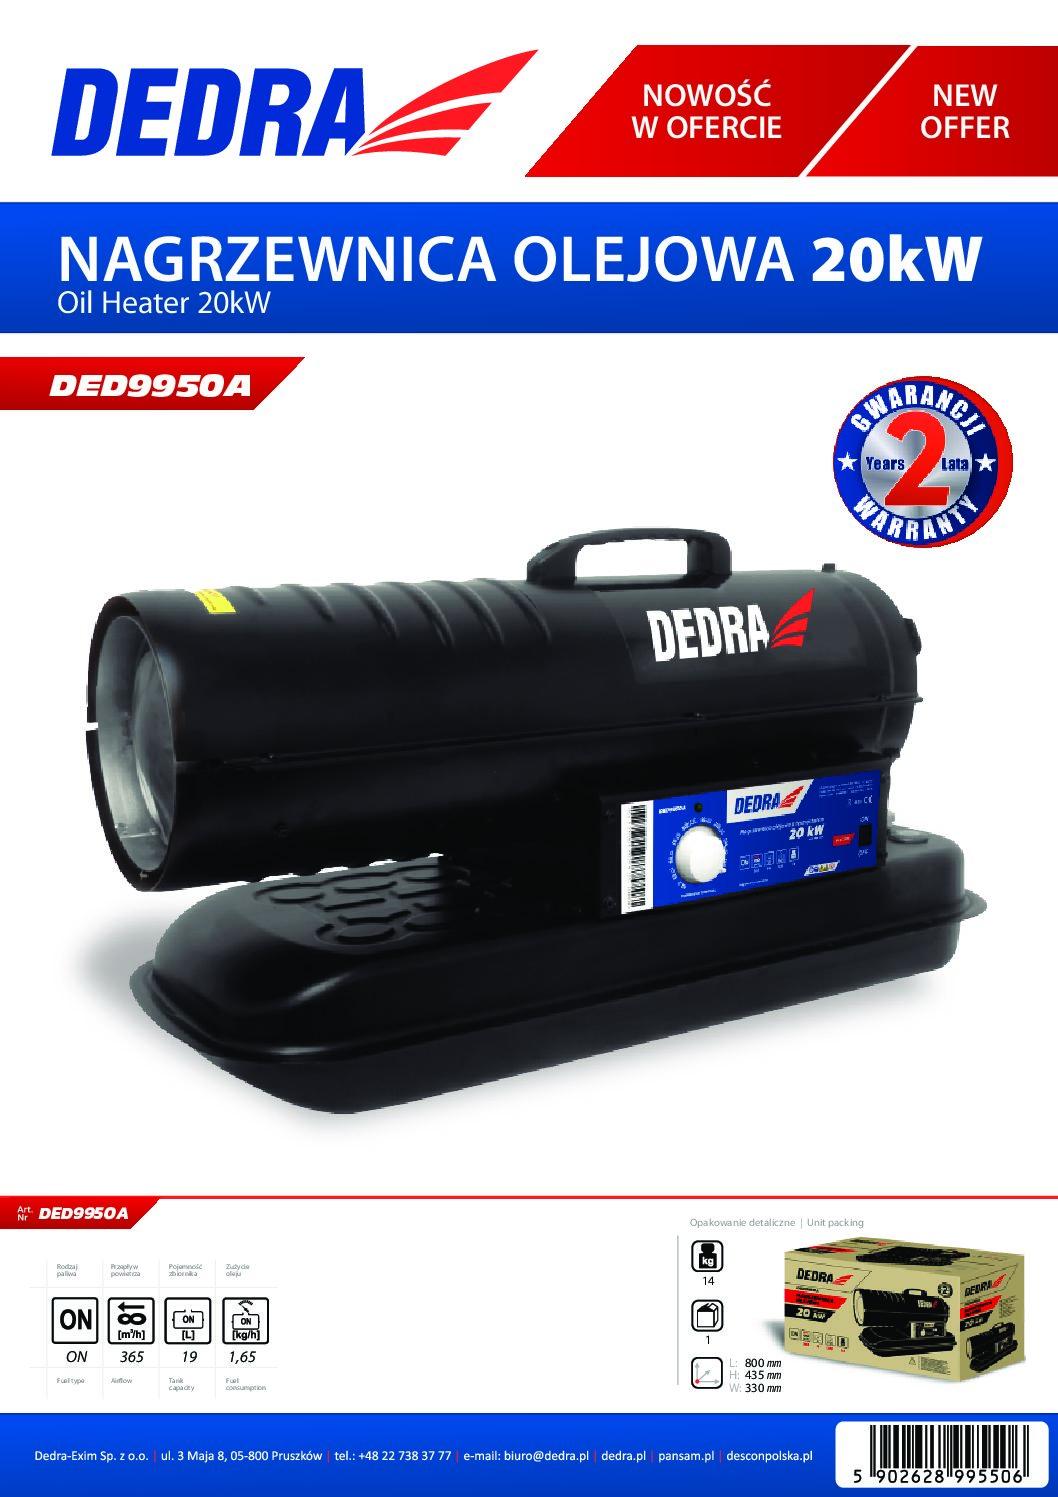 Dedra olajüzemű gázolajos hőlégfúvó 20kW DED9950A